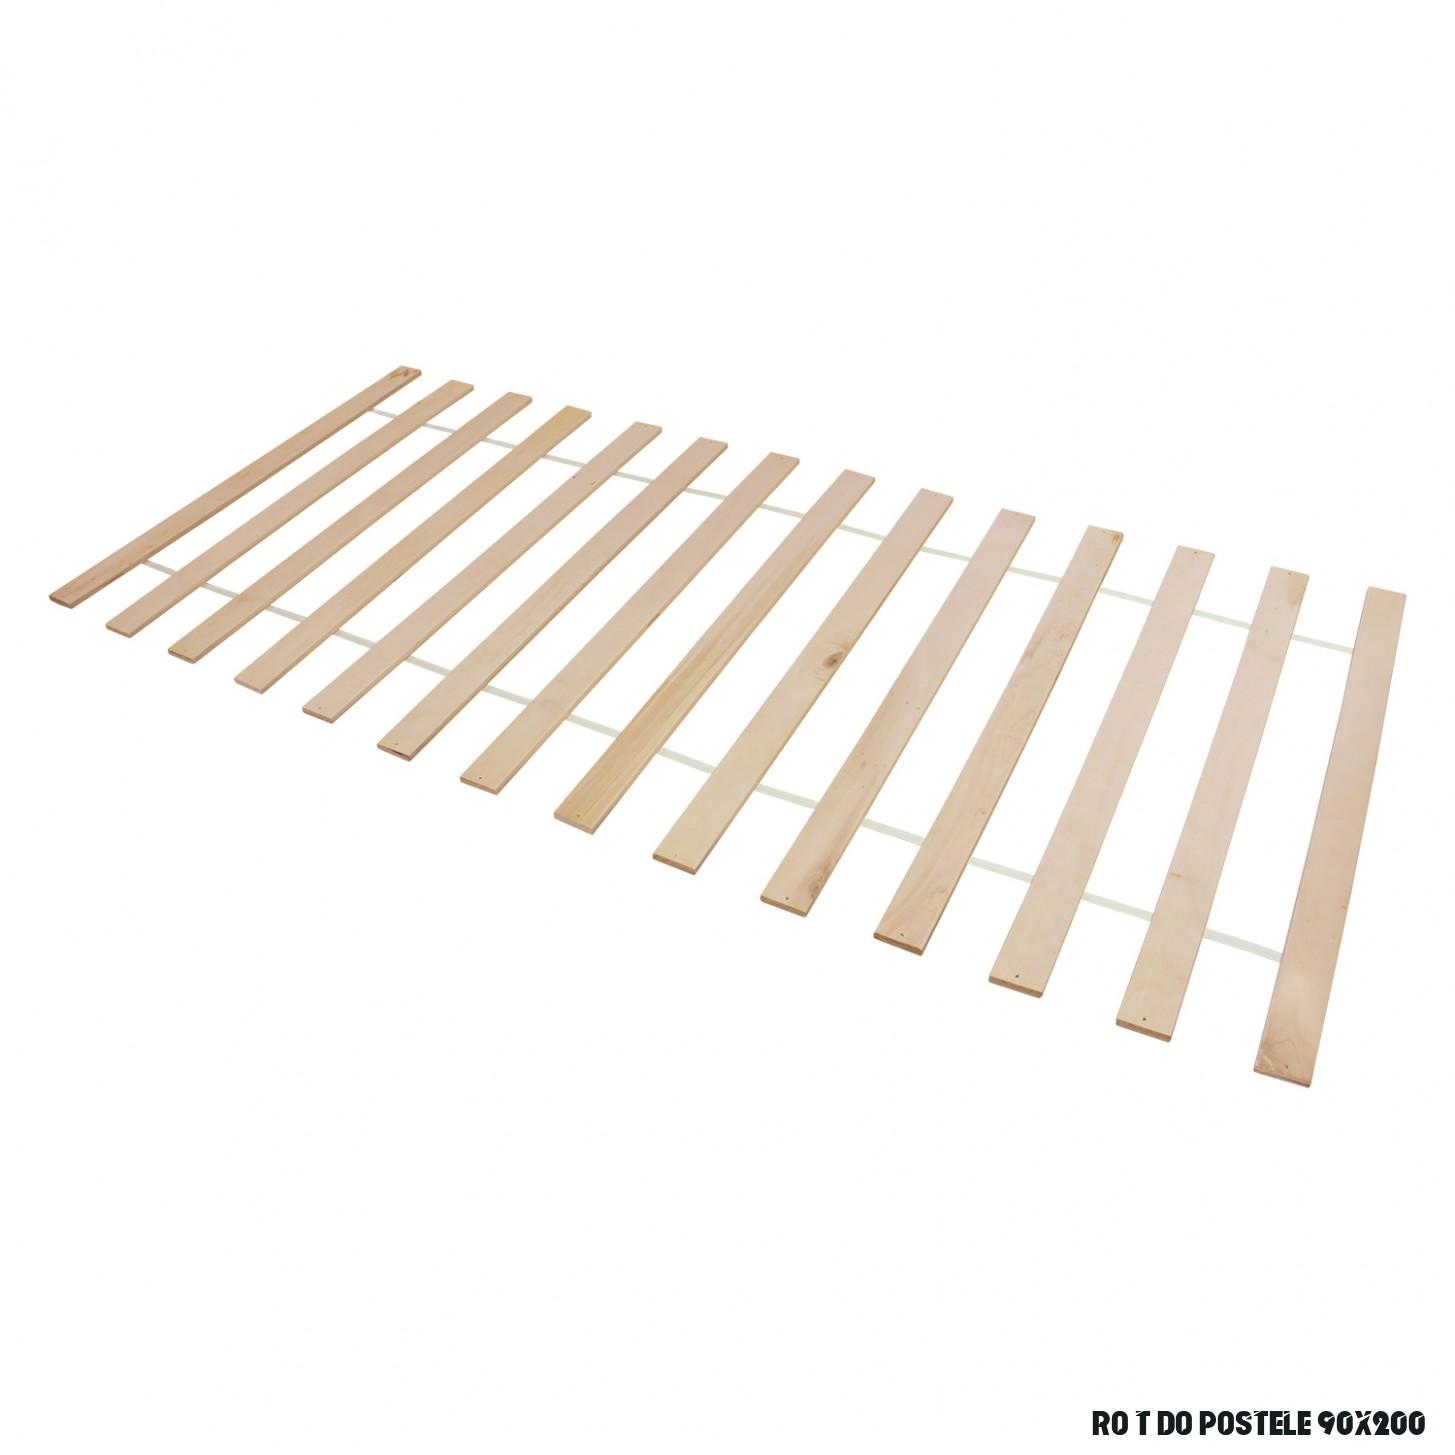 Lamelový rošt 7x7 cm - Postelové rošty - IDEA nábytek